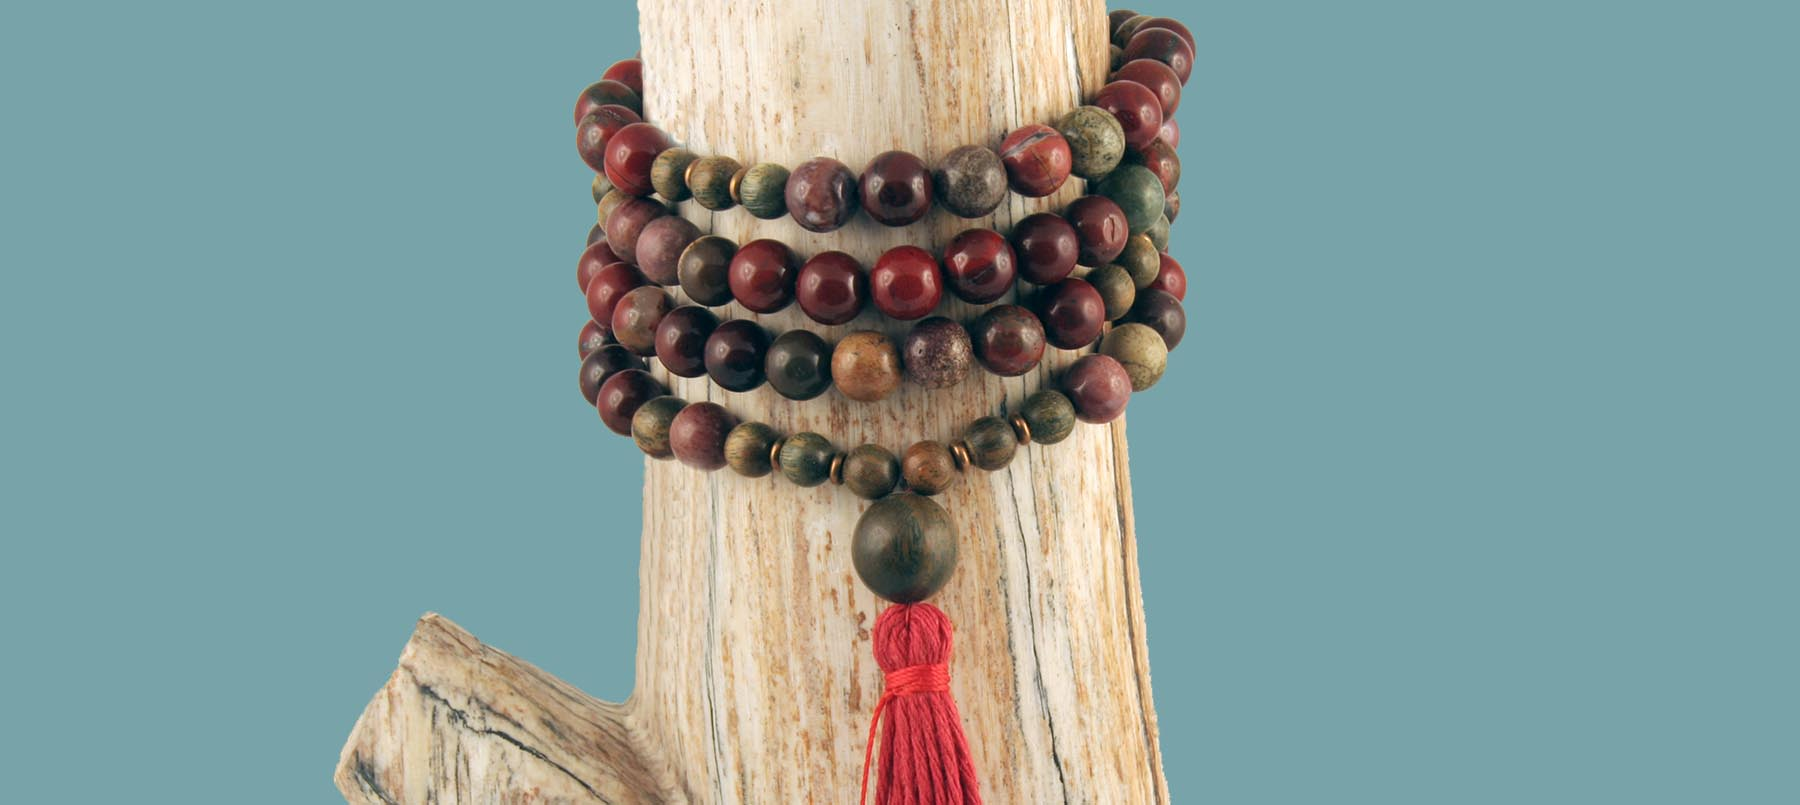 Vibrational healing tools: shop our crystal singing bowls